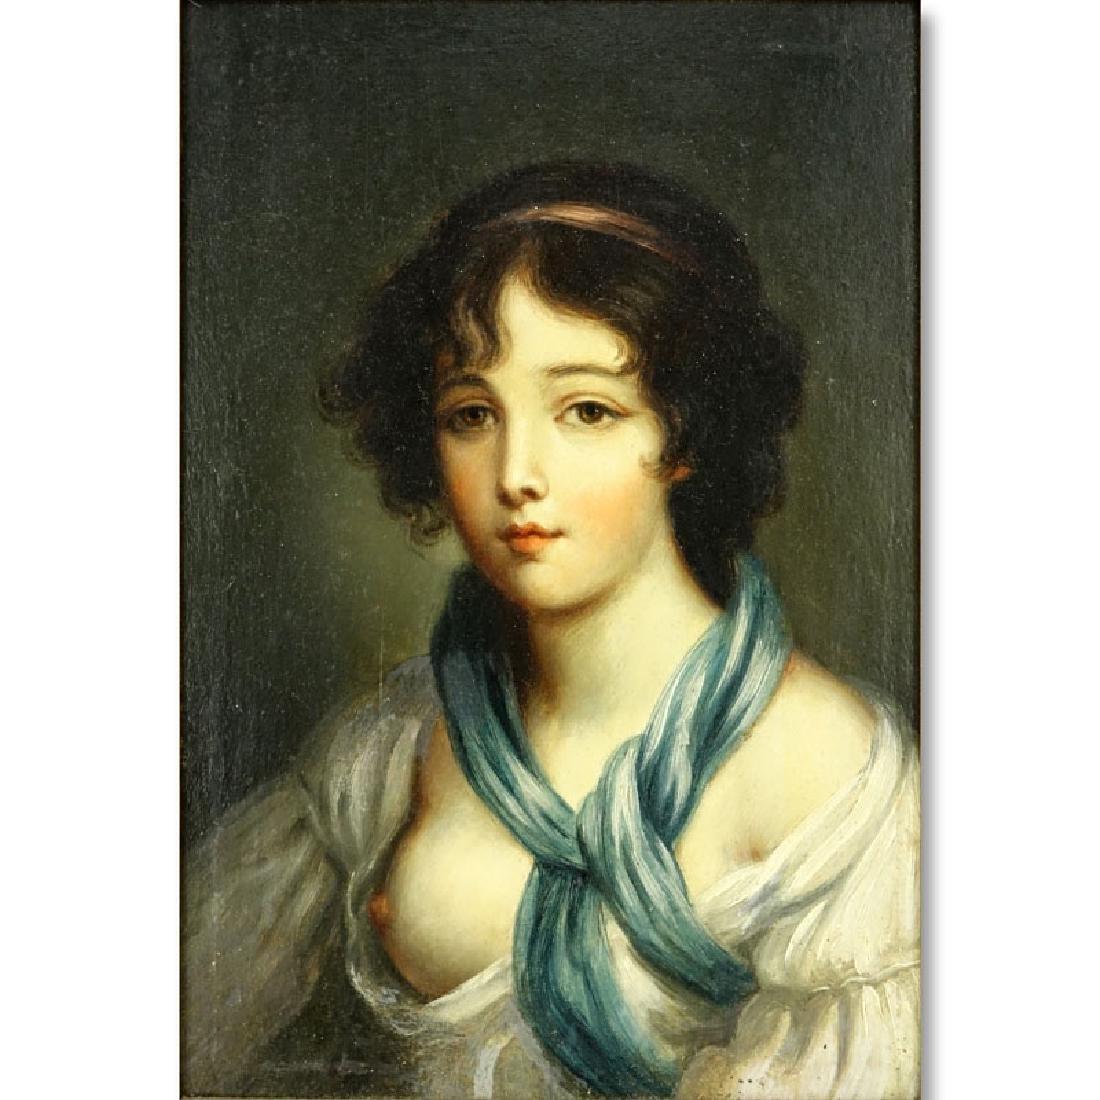 19/20th Century Oil on Panel Old Master Style, Portrait